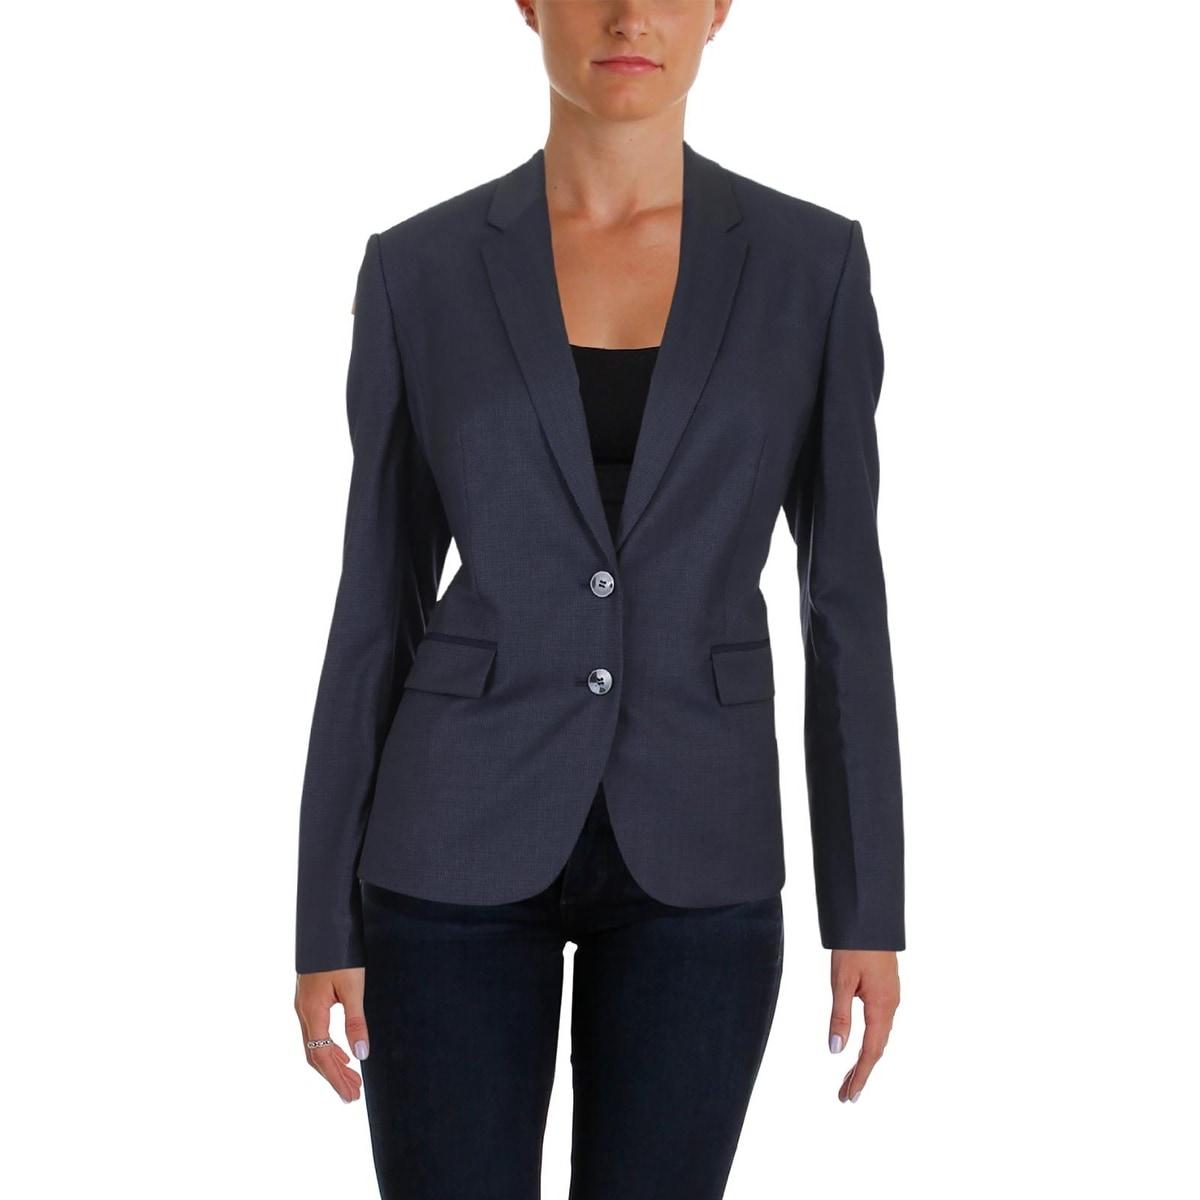 d1d6ae913 Shop BOSS Hugo Boss Womens Jylana Blazer Virgin Wool Contrast Piping - Free  Shipping Today - Overstock - 24076941